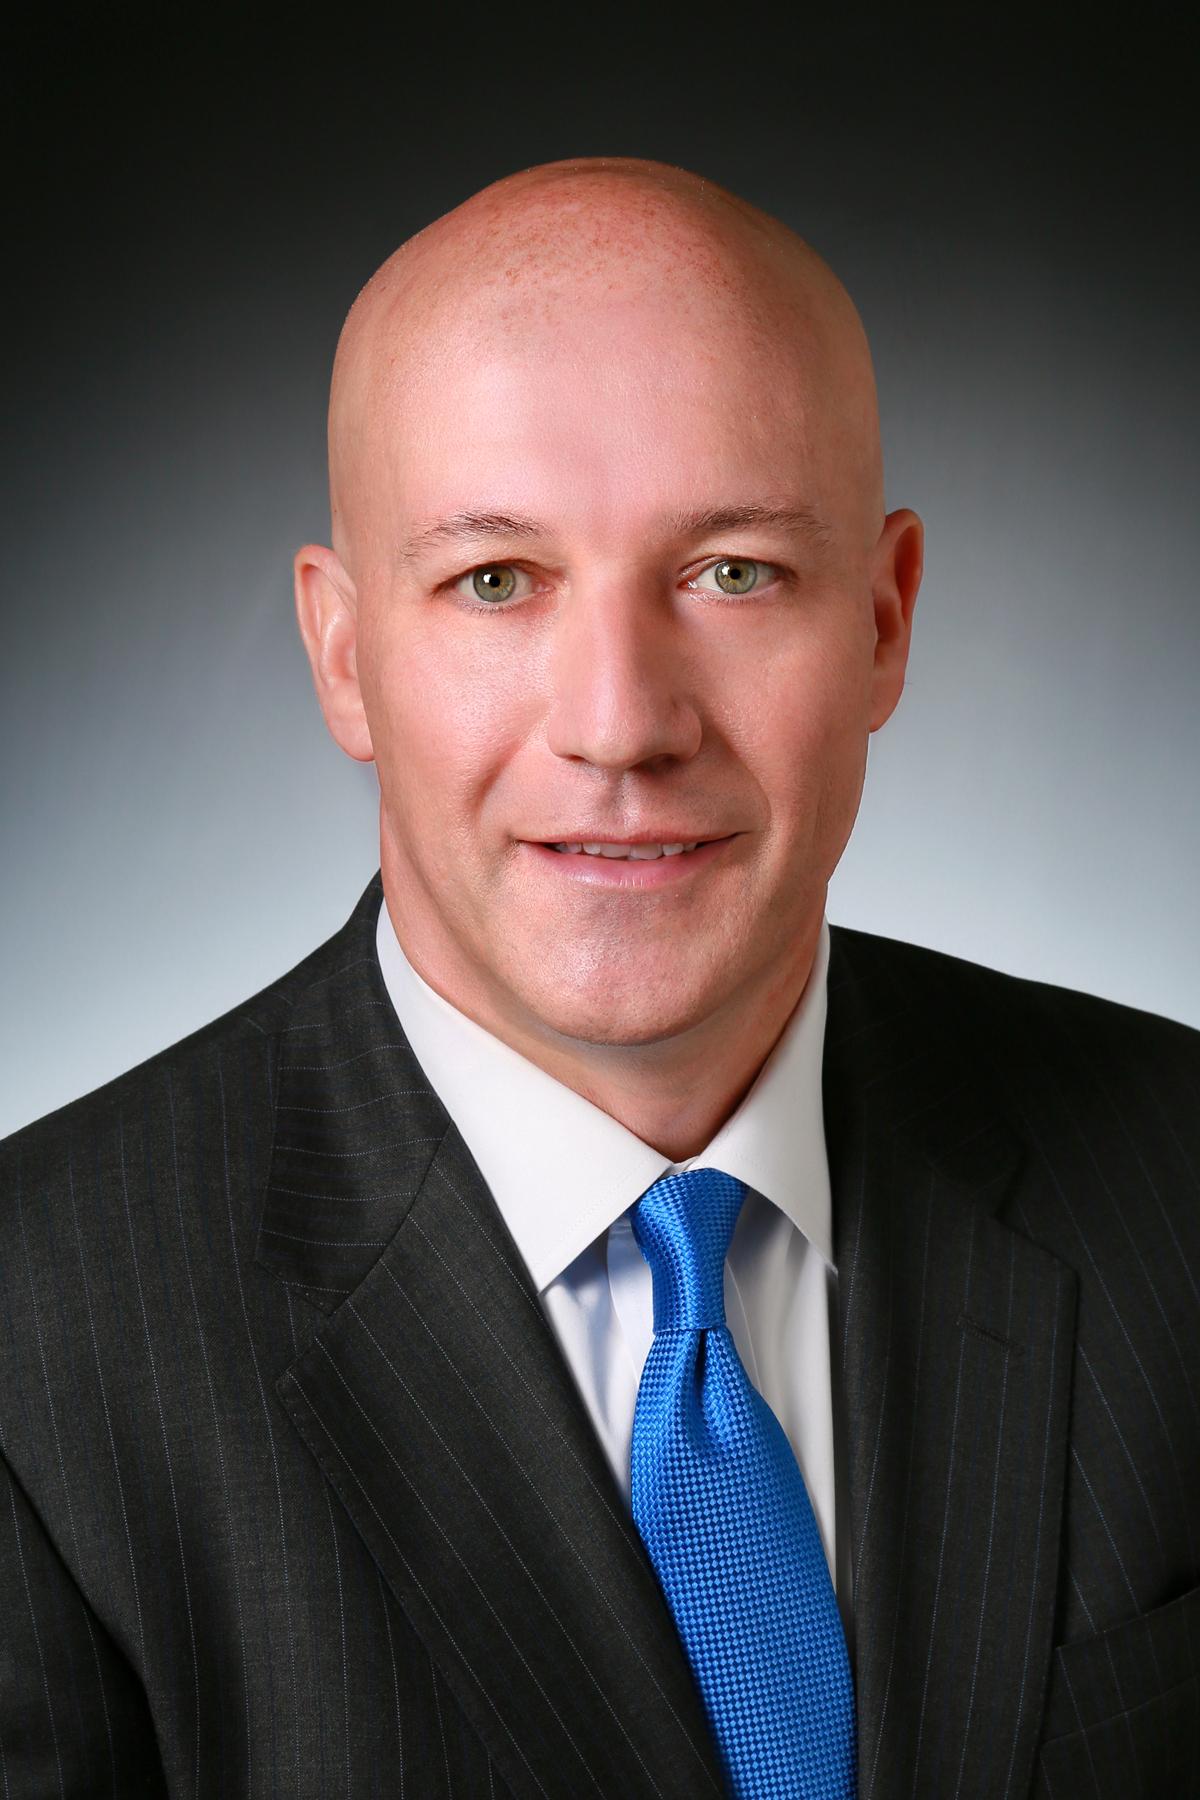 Mr. Robb Hudson, CEO - Mitsui Seiki USA, Inc. (Photo: Business Wire)